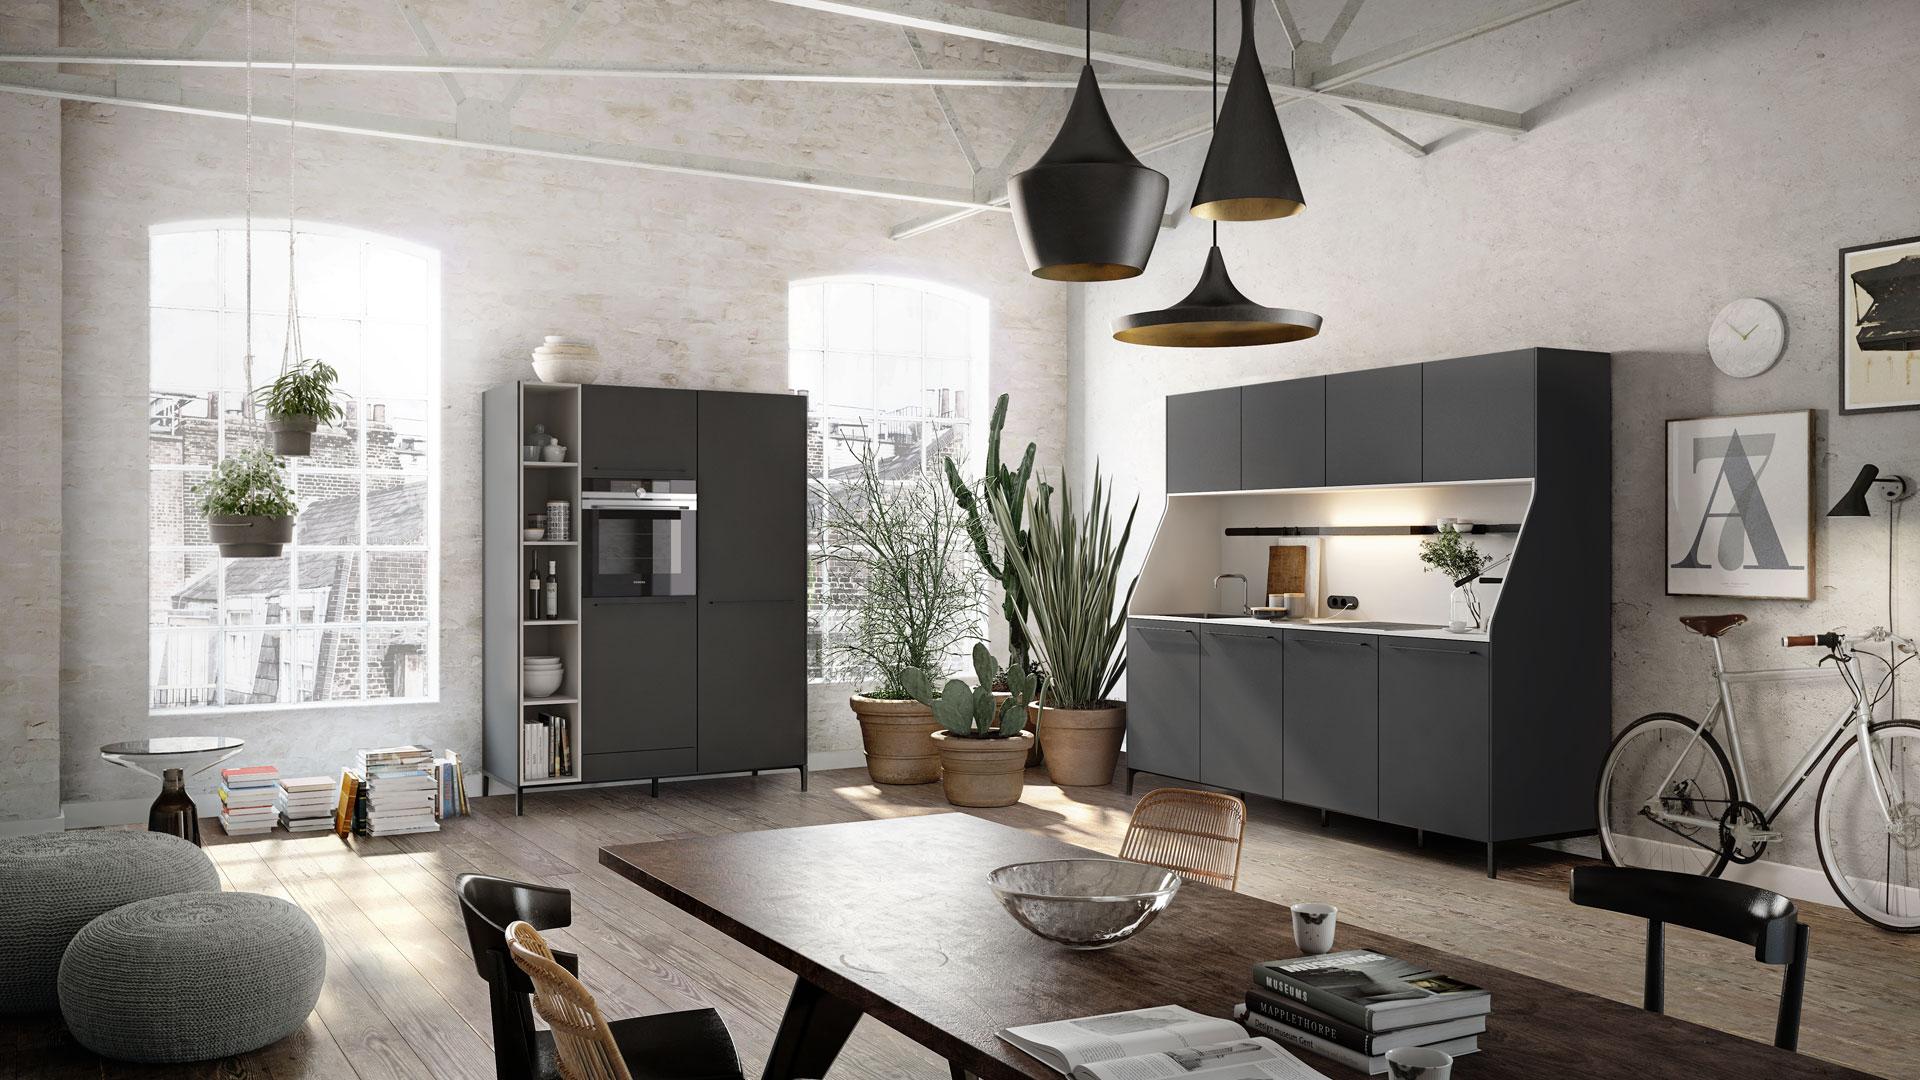 Siematic kitchens gloucester cheltenham gloucesterhire for Siematic kitchen design